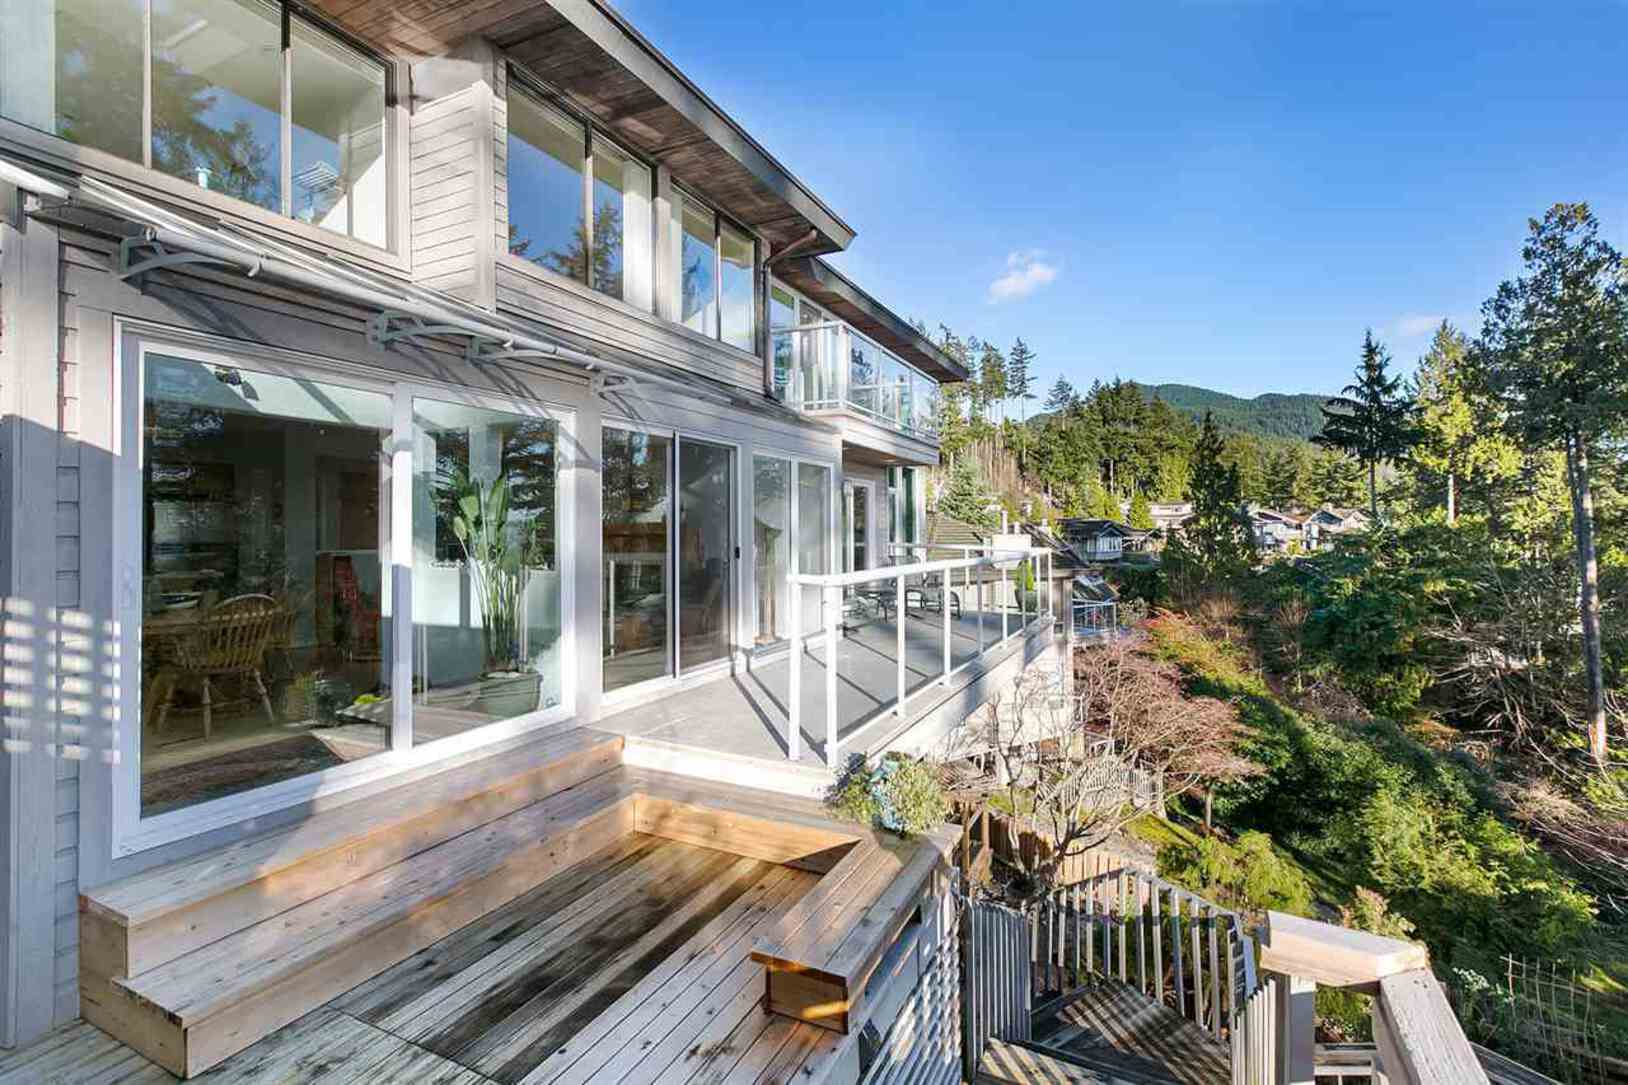 4864-vista-place-caulfeild-west-vancouver-19 at 4864 Vista Place, Caulfeild, West Vancouver